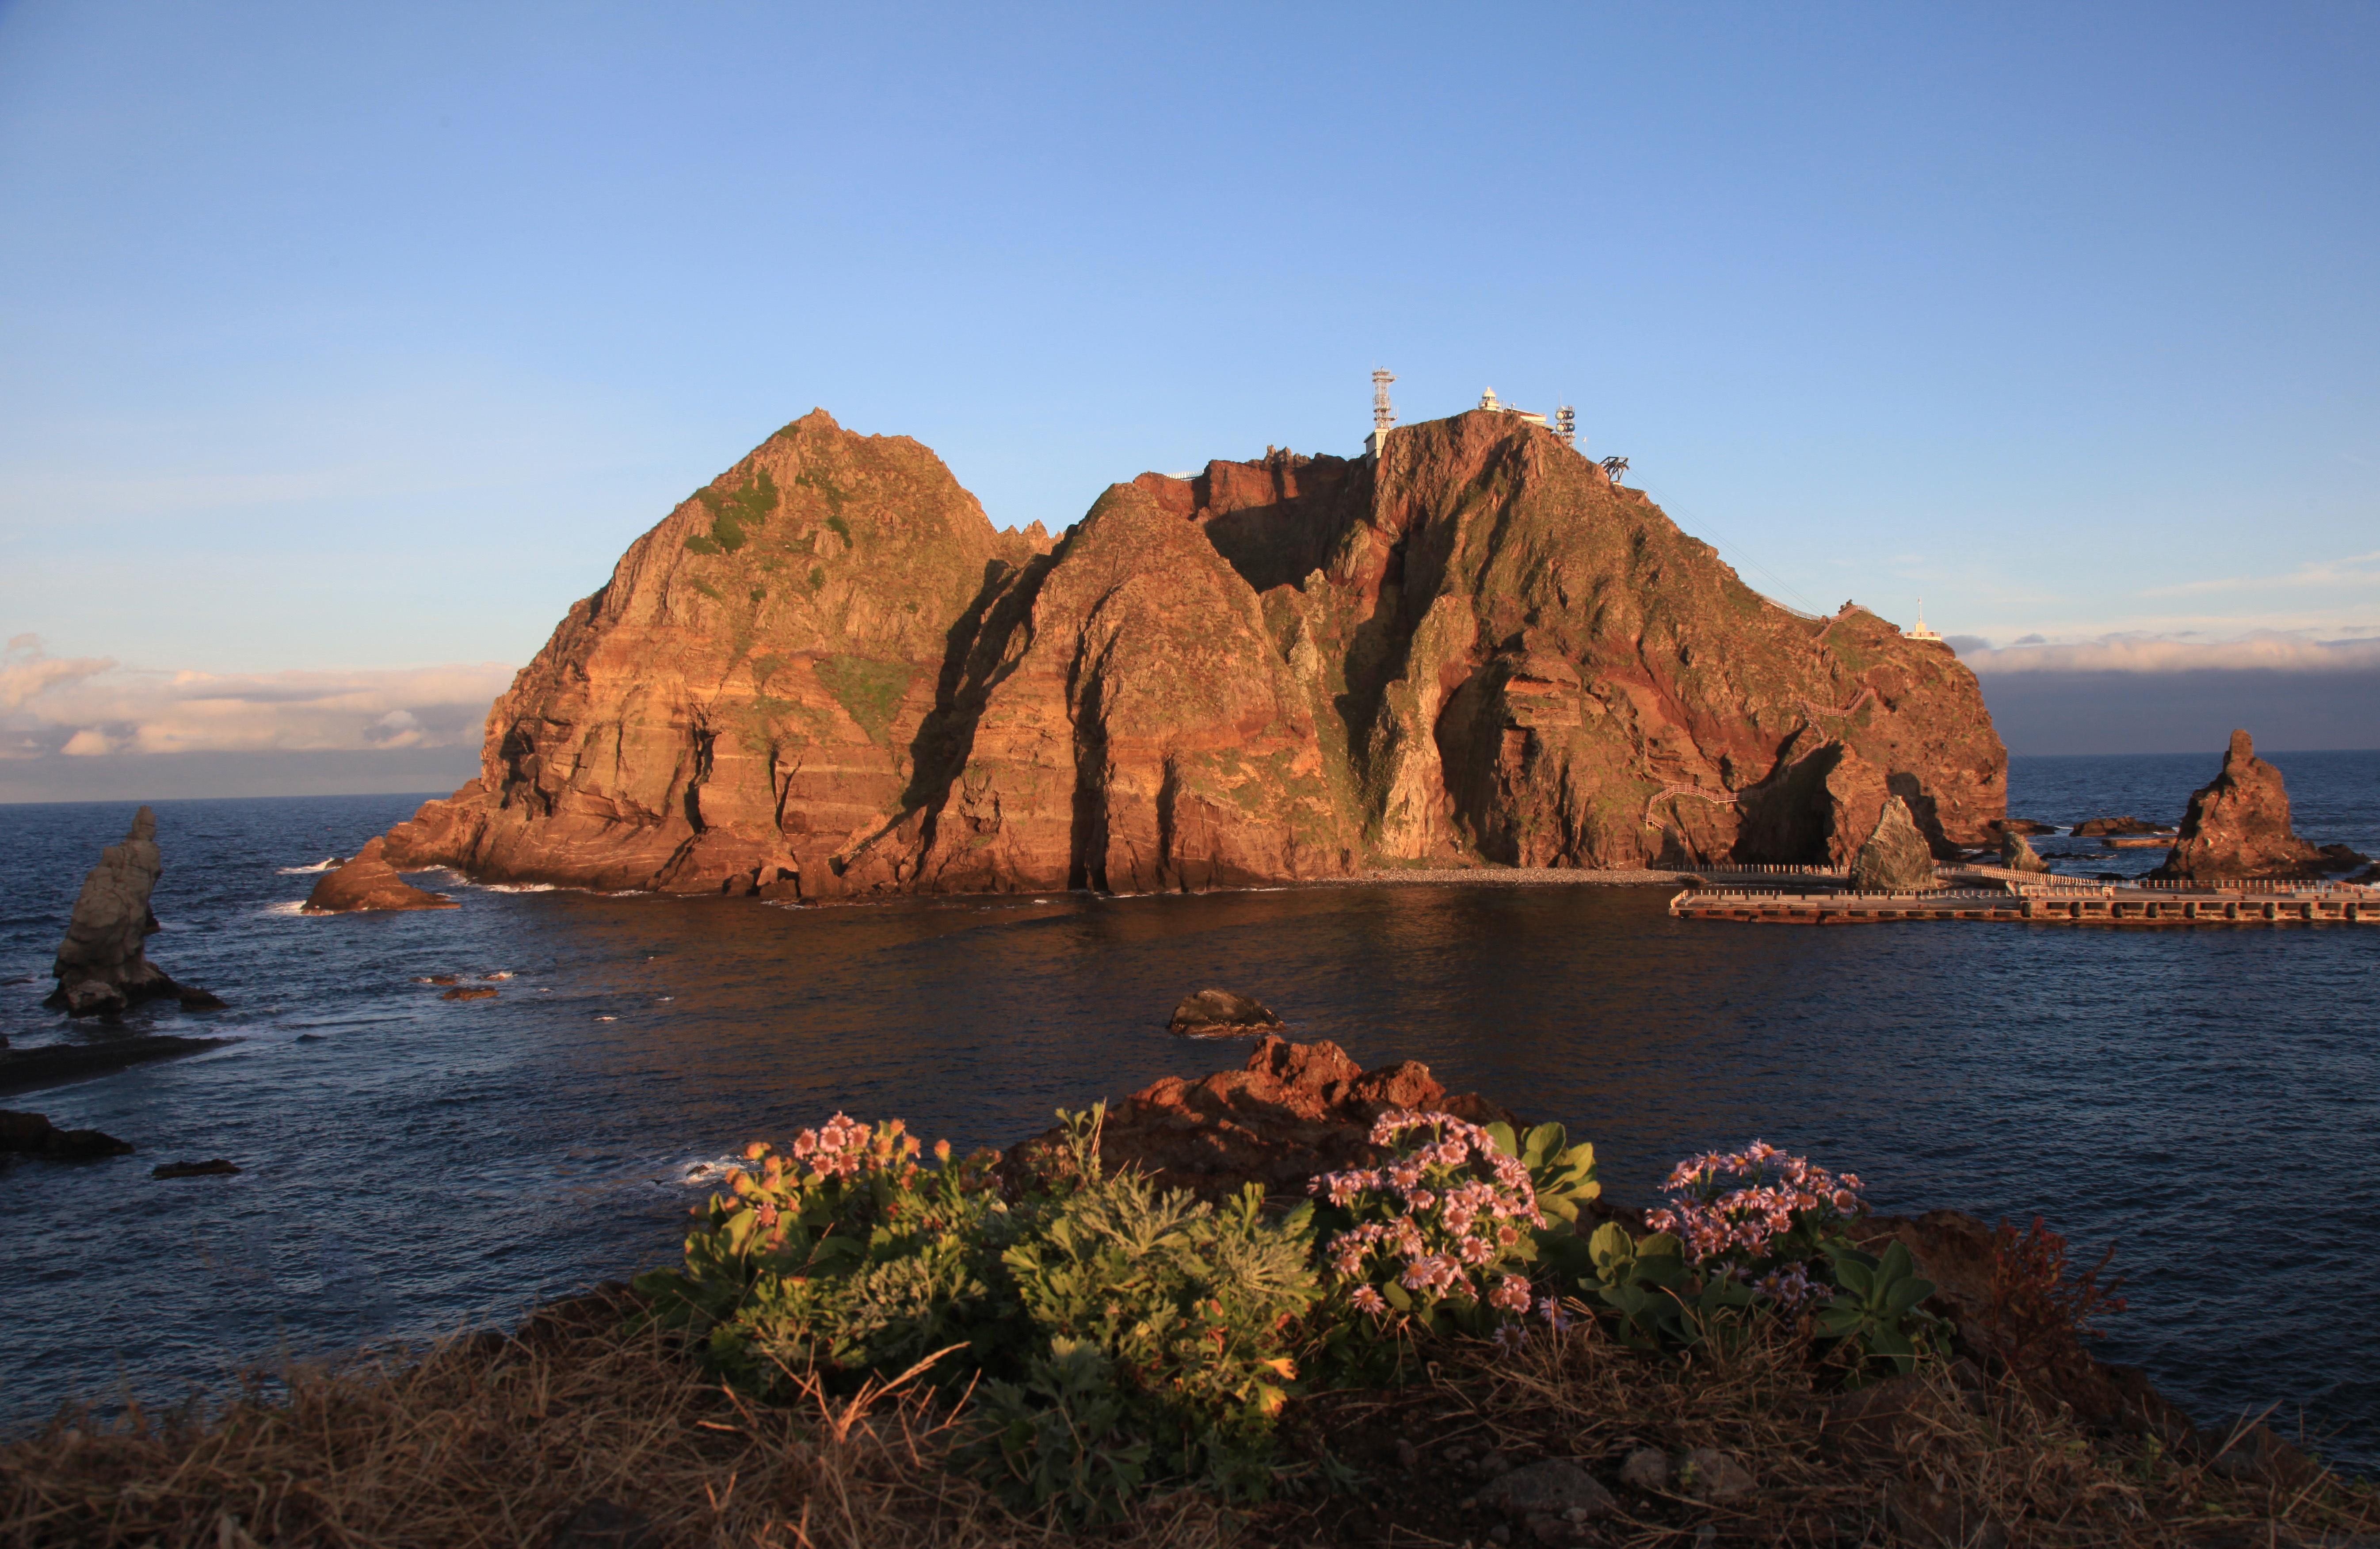 71940 Screensavers and Wallpapers Island for phone. Download Nature, Rocks, Island, Dokdo, Korea, Gyeongsangnam-Do, Kensan-Namdo pictures for free